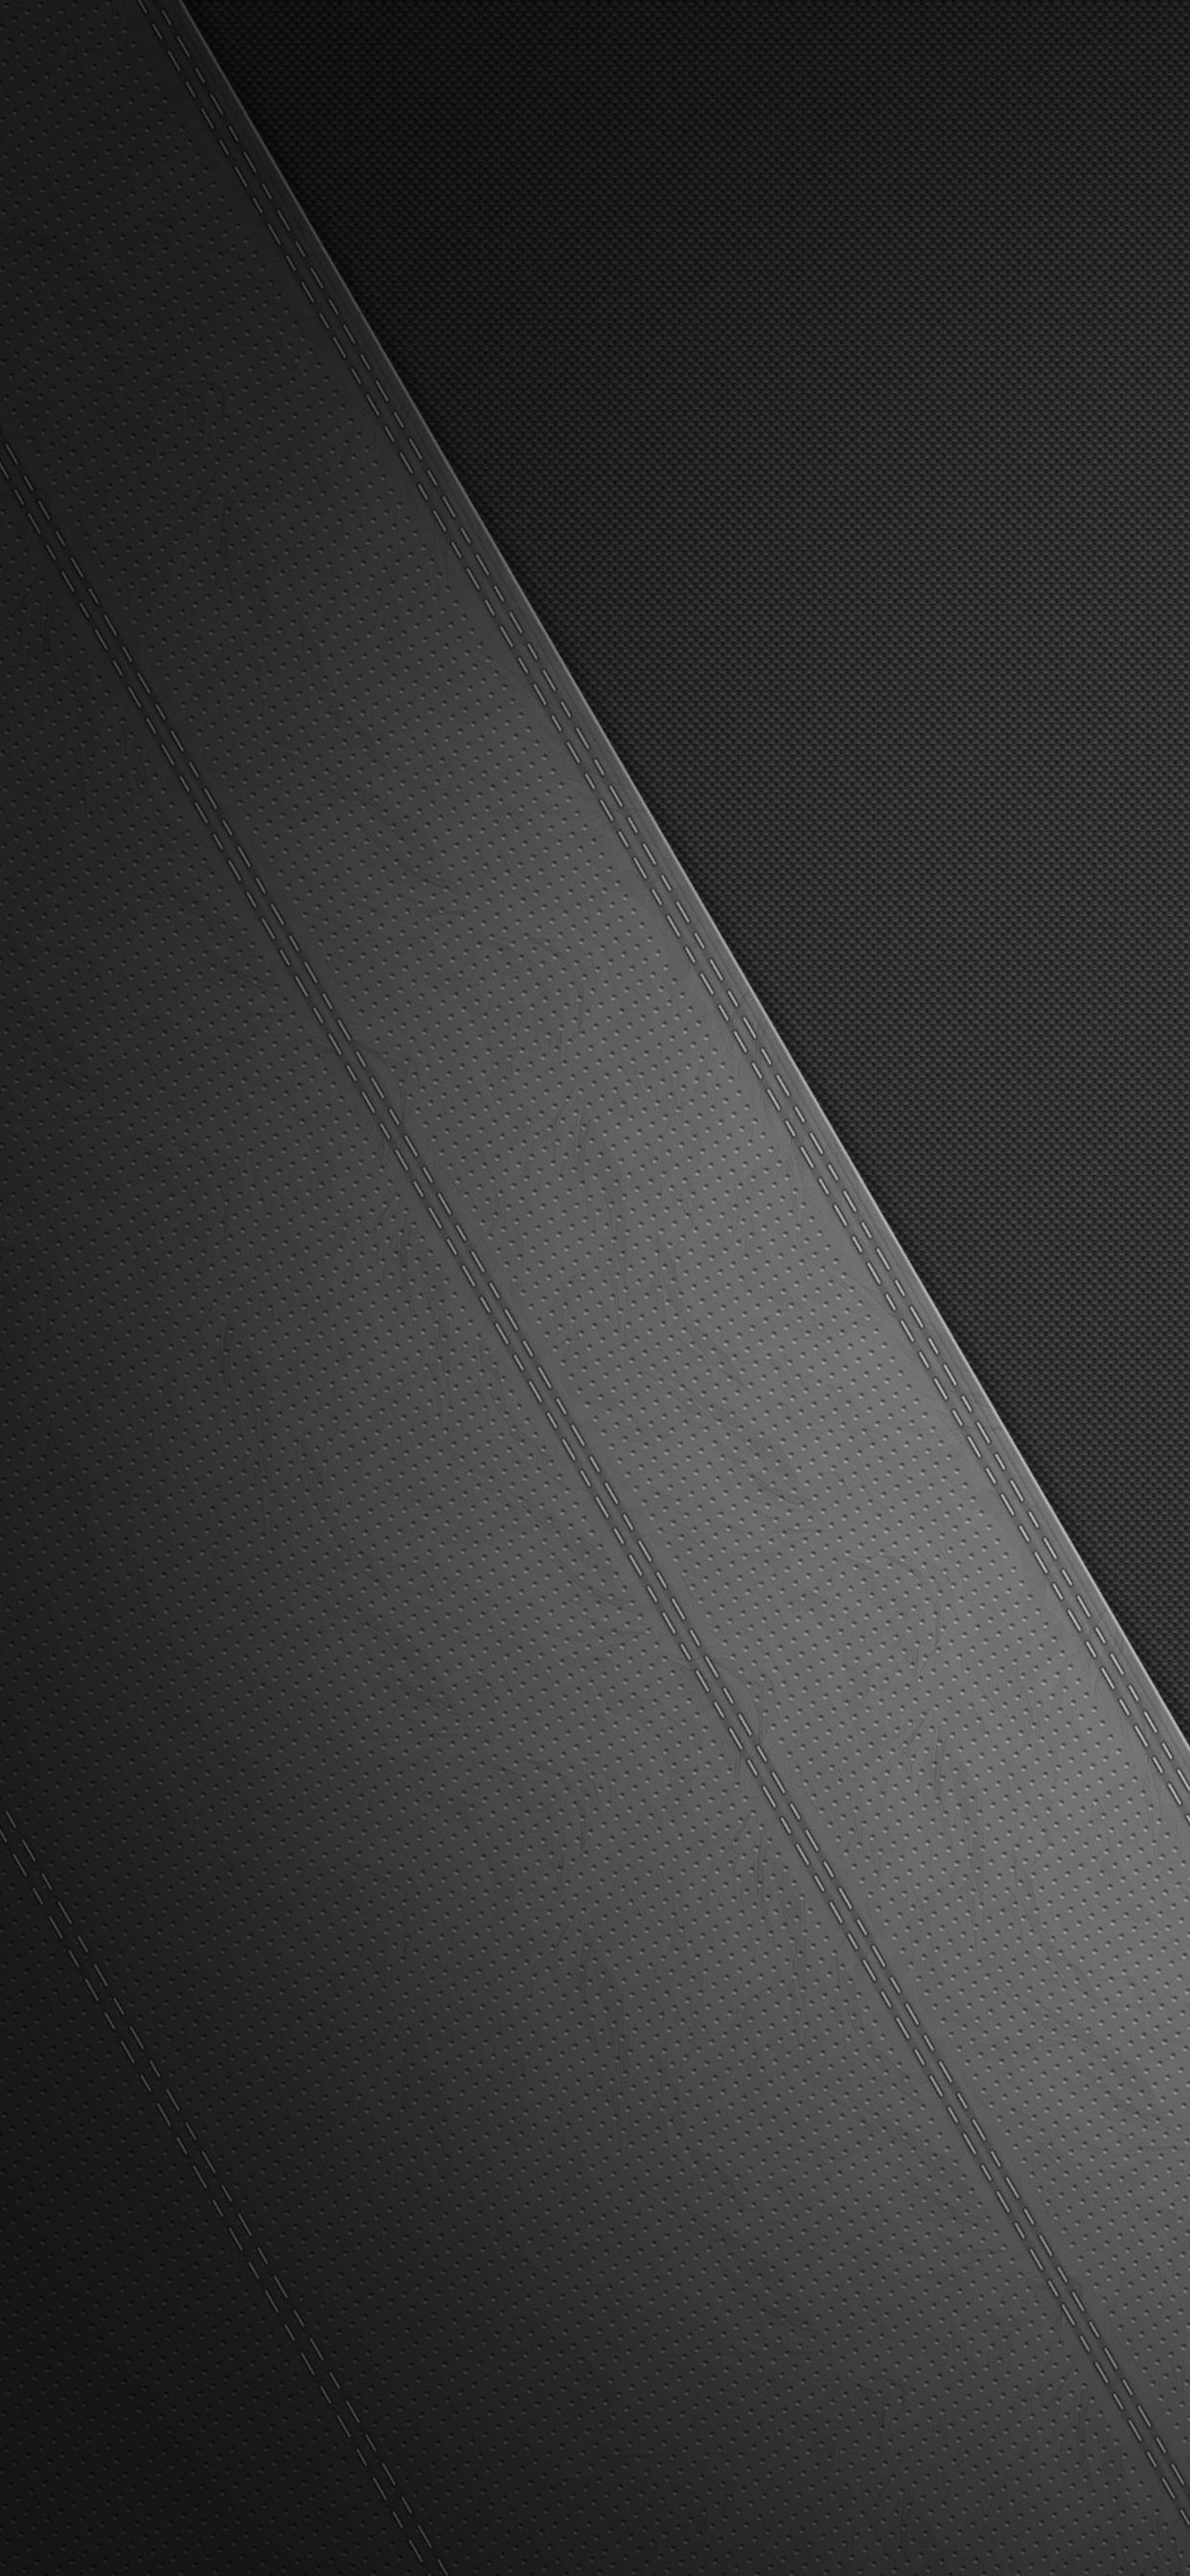 1242x2688 Leather Texture Black 4k Iphone Xs Max Hd 4k